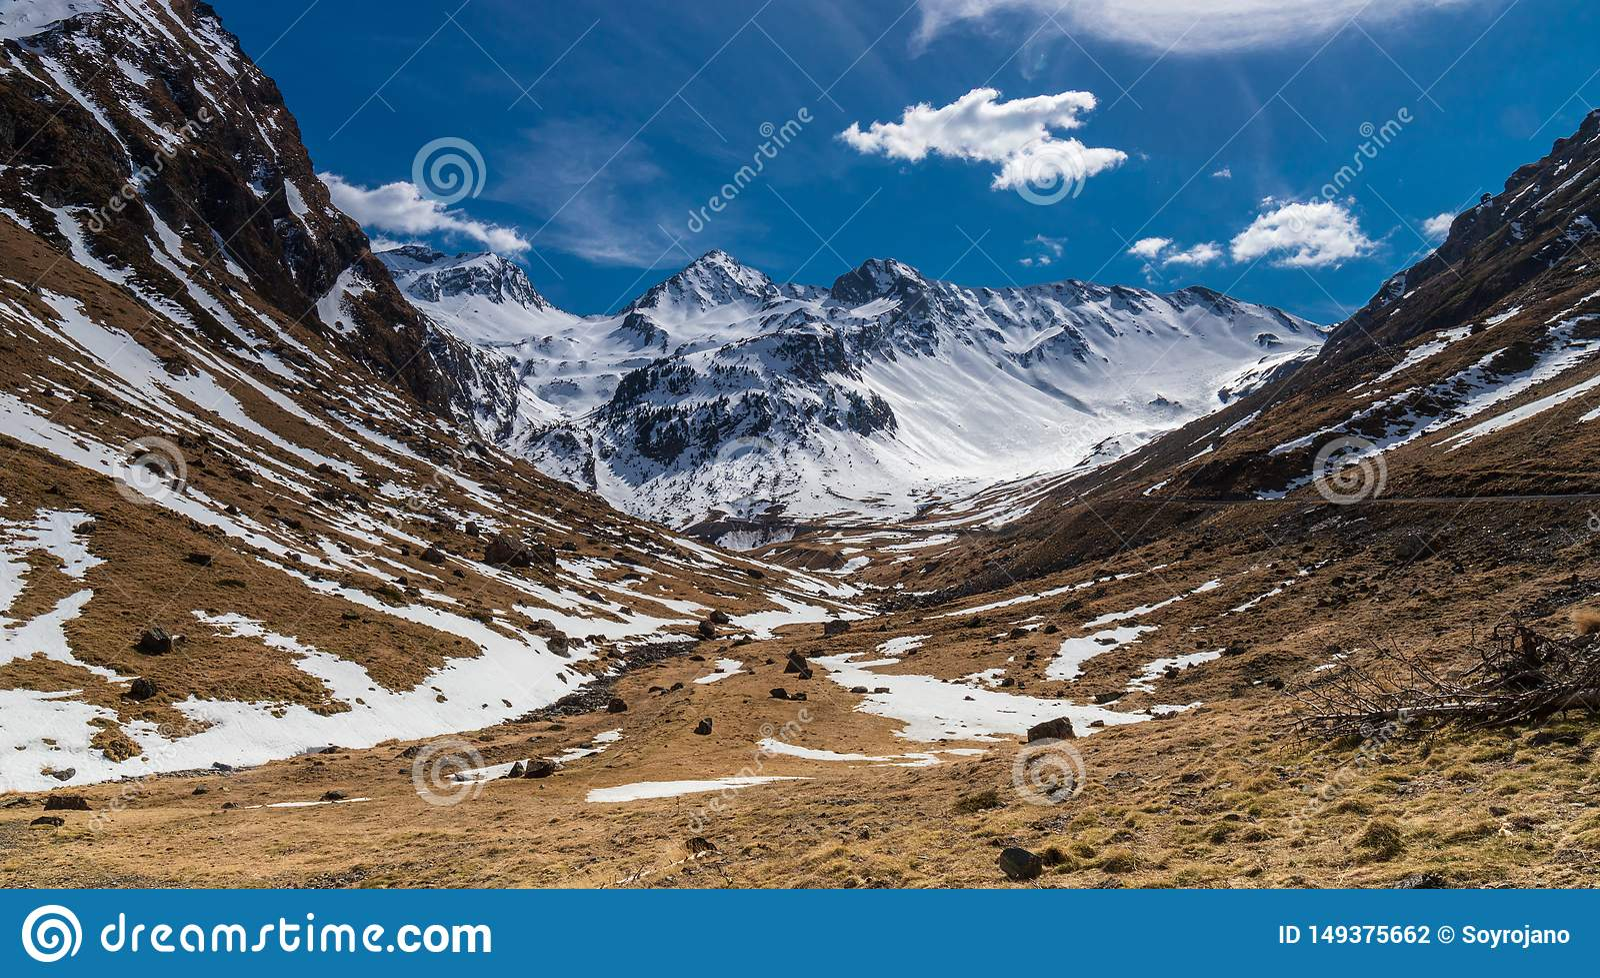 Горы ландшафта Snowy чудесные